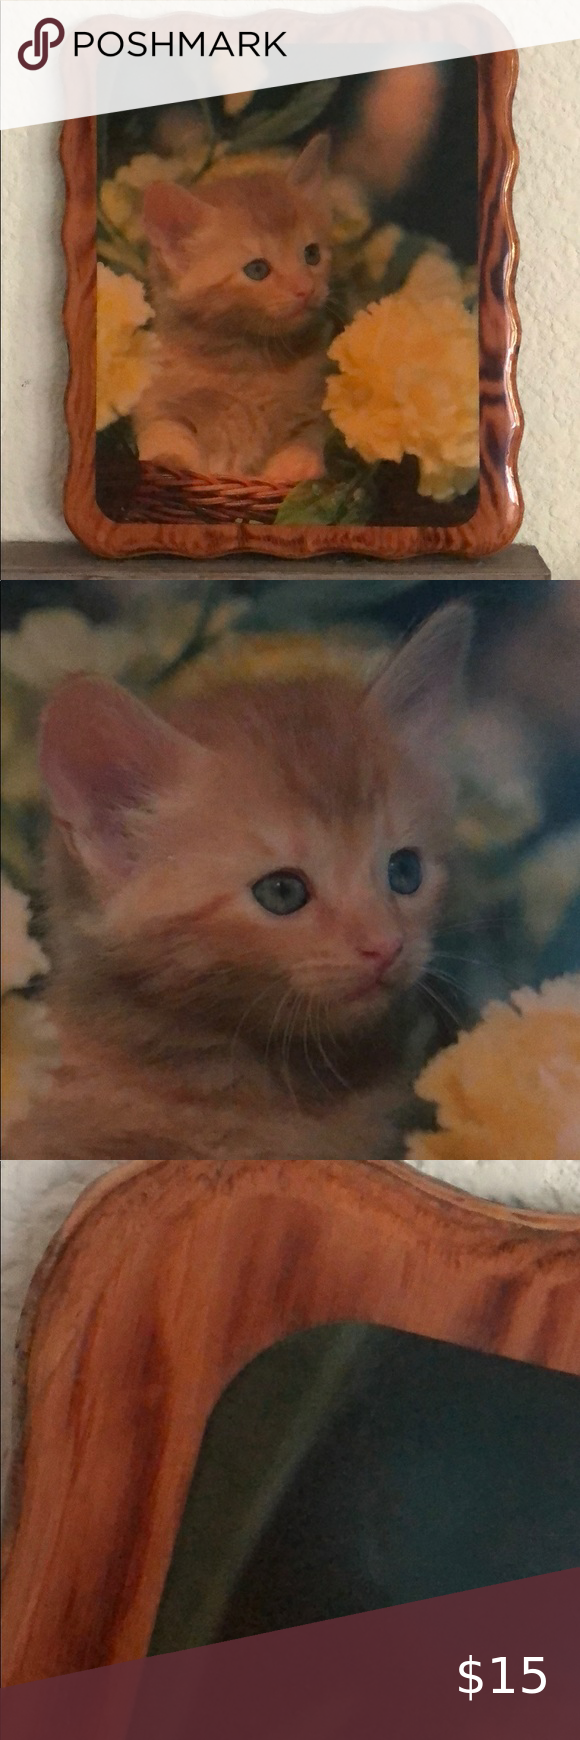 Wooden Kitten Photo In 2020 Kitten Photos Kitten Photo